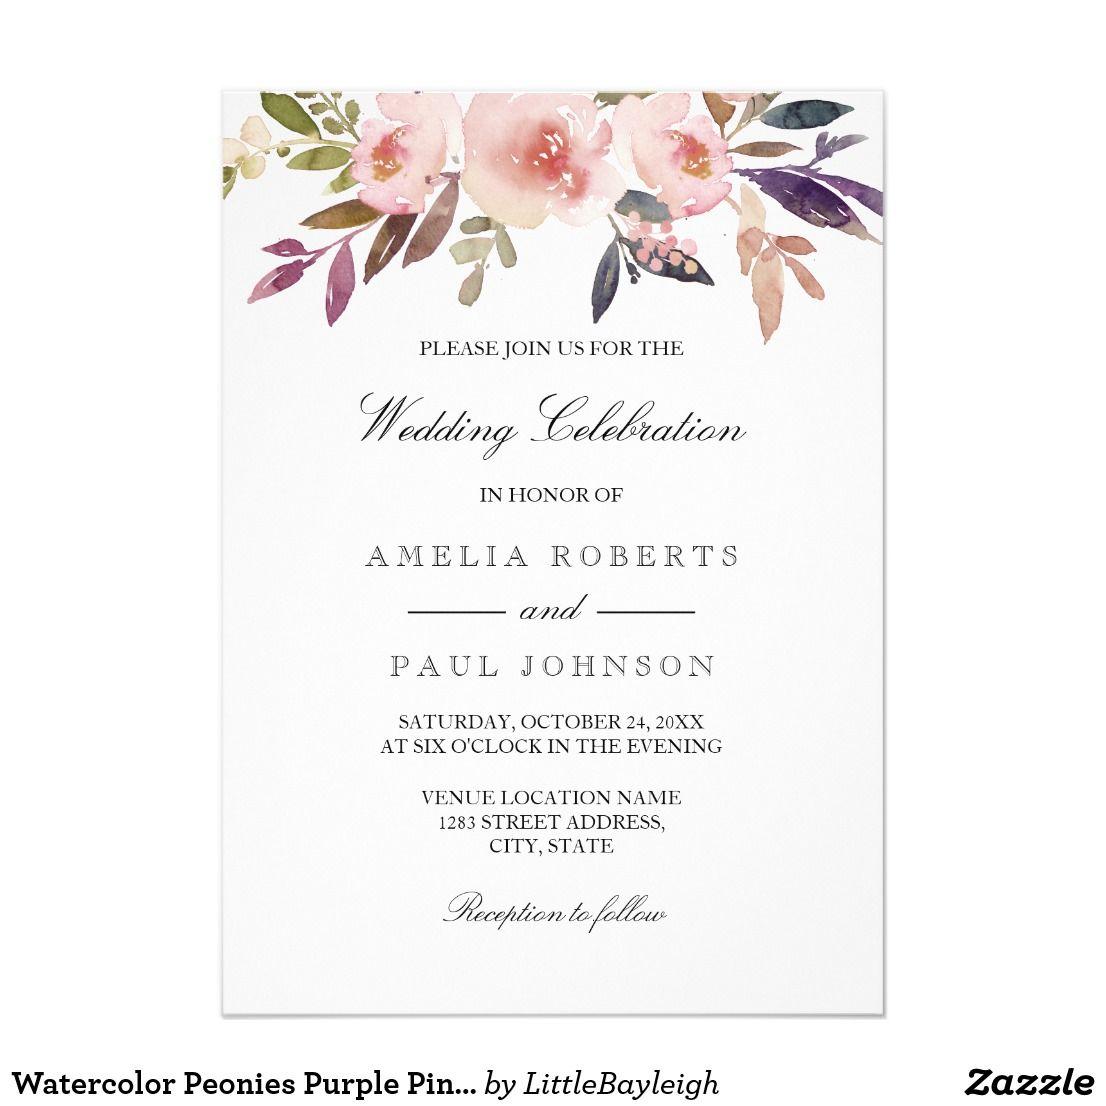 Watercolor Peonies Purple Pink Wedding Invitation | Purple pink ...